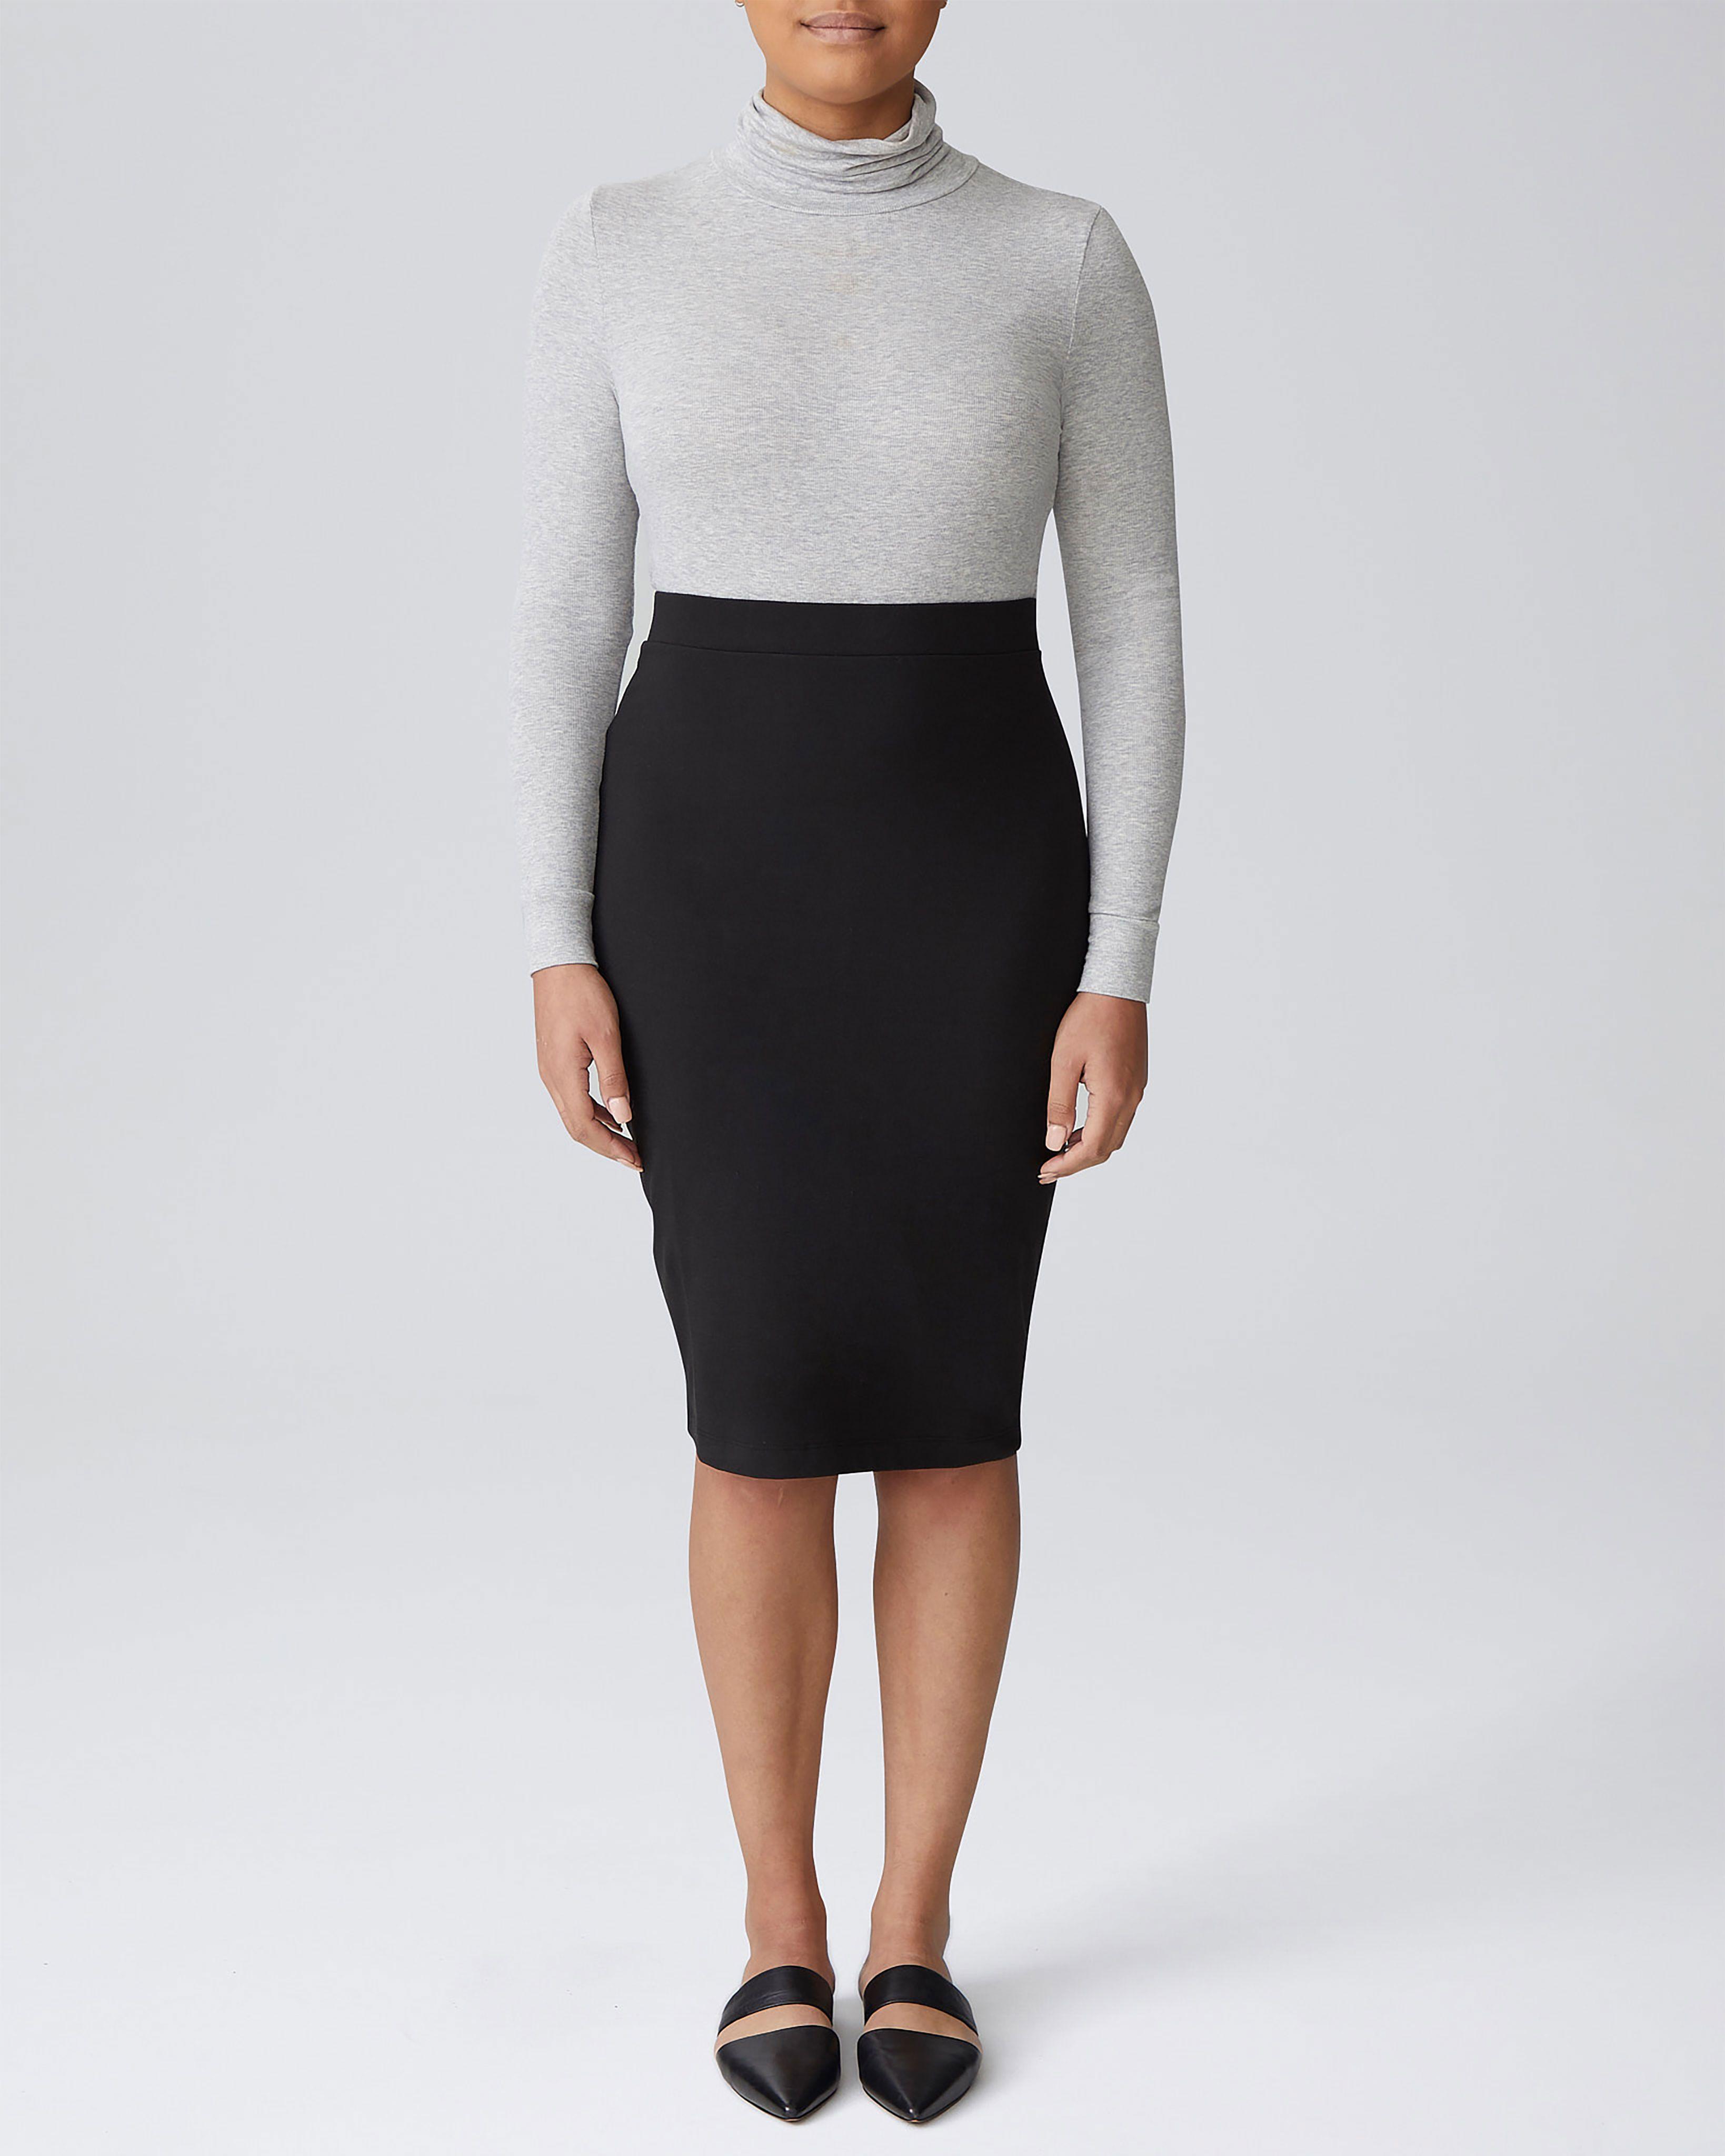 Danube Jersey Skirt - Black